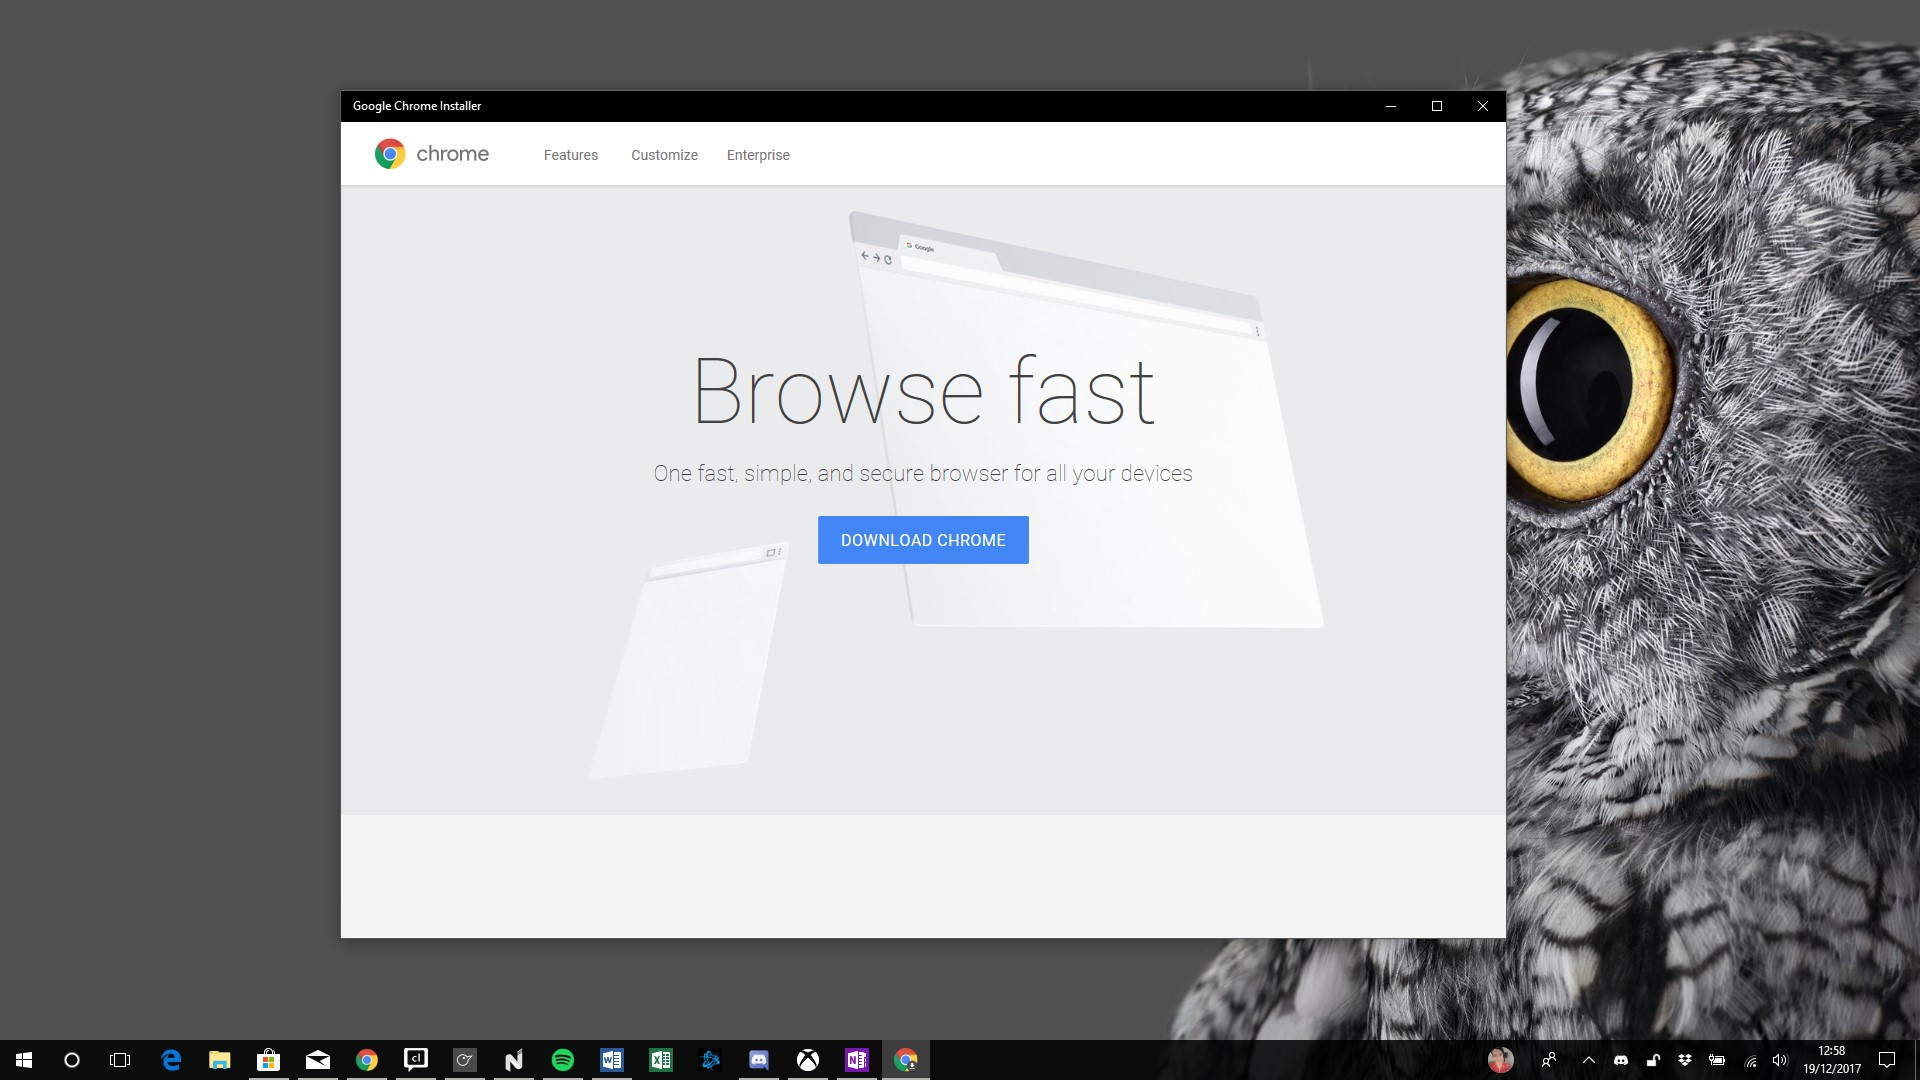 Microsoft убрал установщик Google Chrome изсвоего магазина приложений